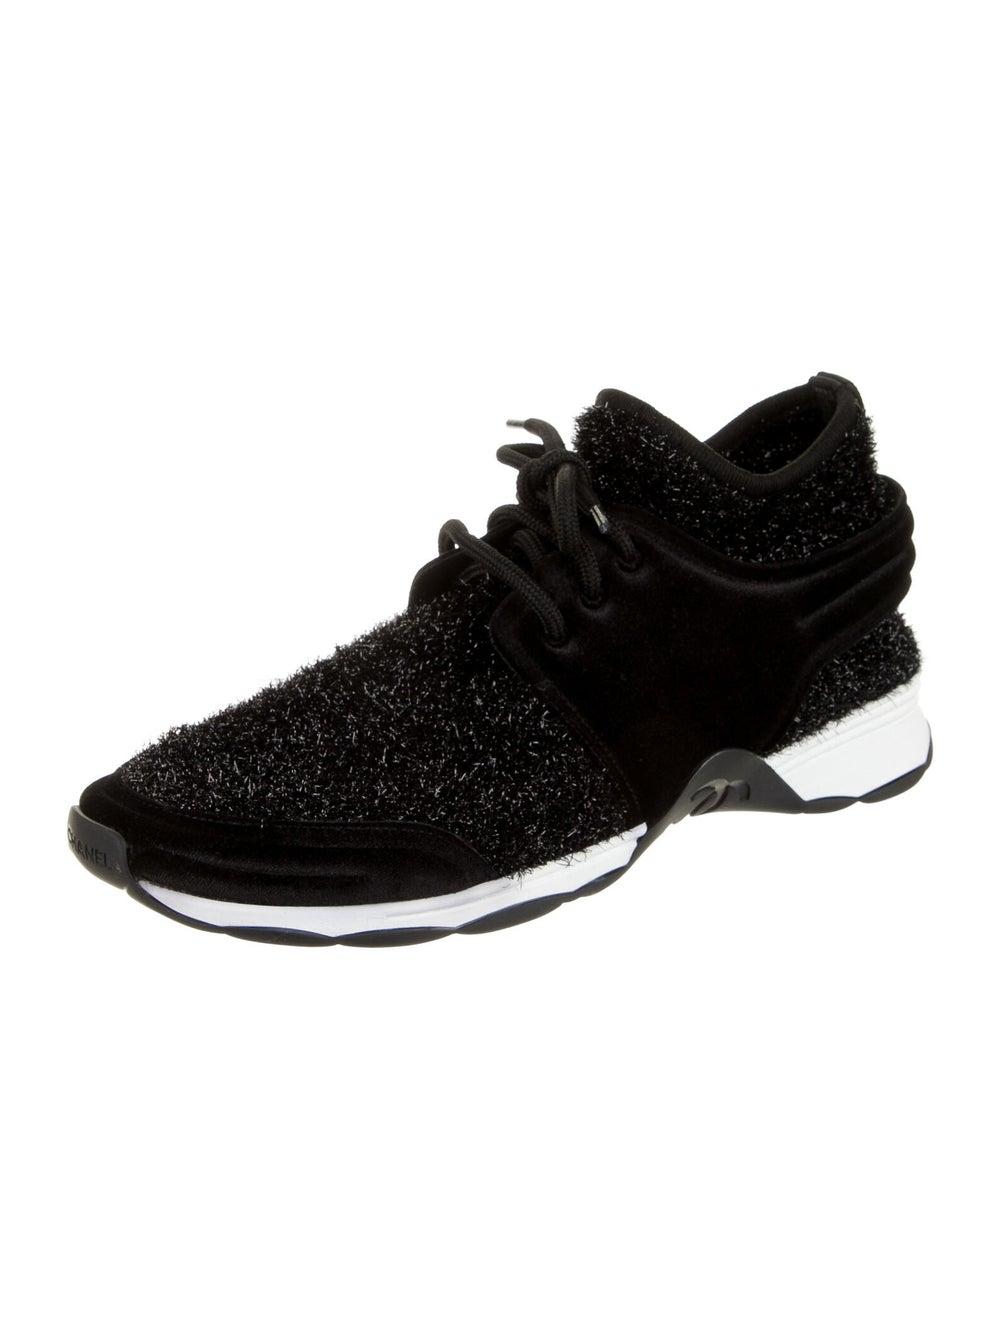 Chanel Tinsel Sock Sneakers Sneakers Black - image 2